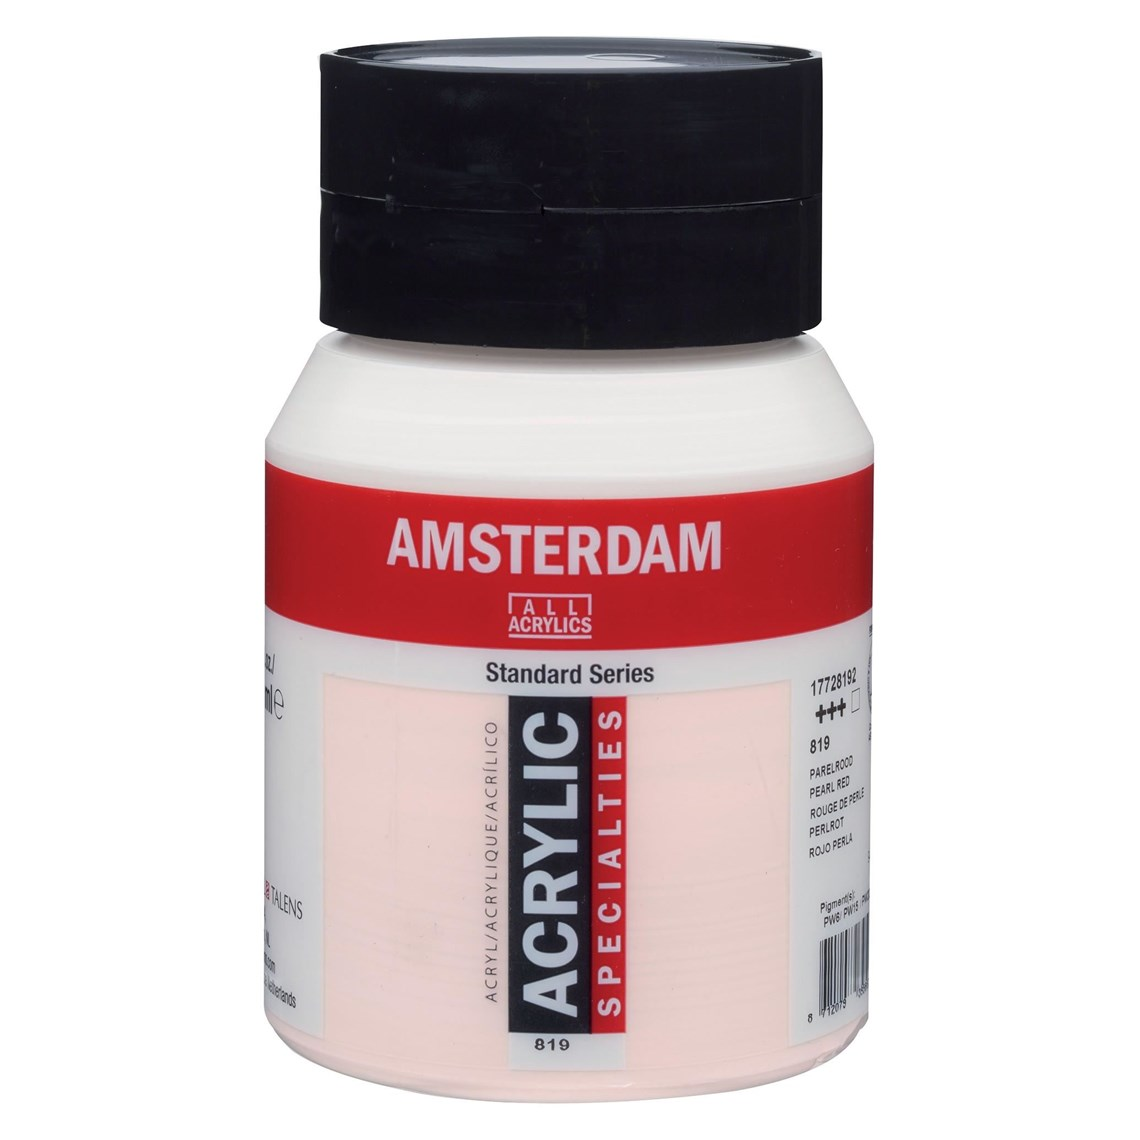 Amsterdam Parelrood 819 specialties